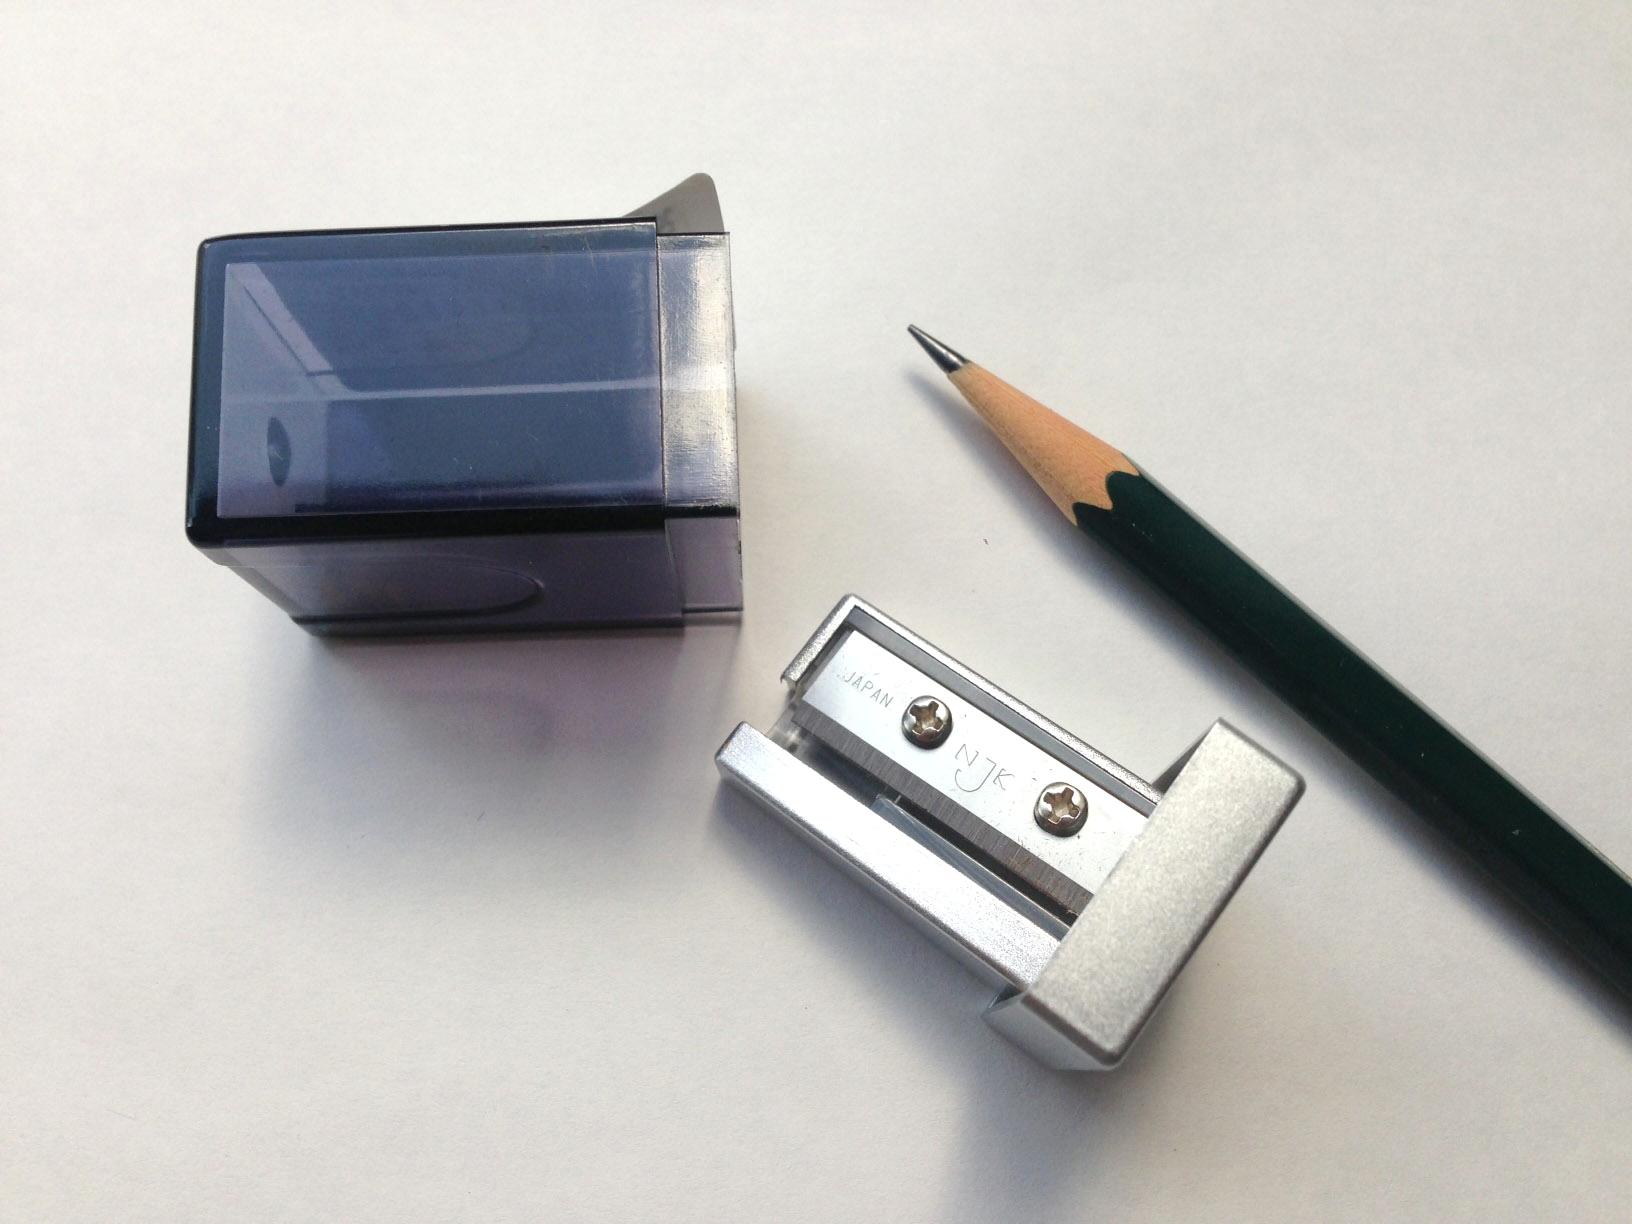 第五十五回「中島重久堂の鉛筆削り器 531S」